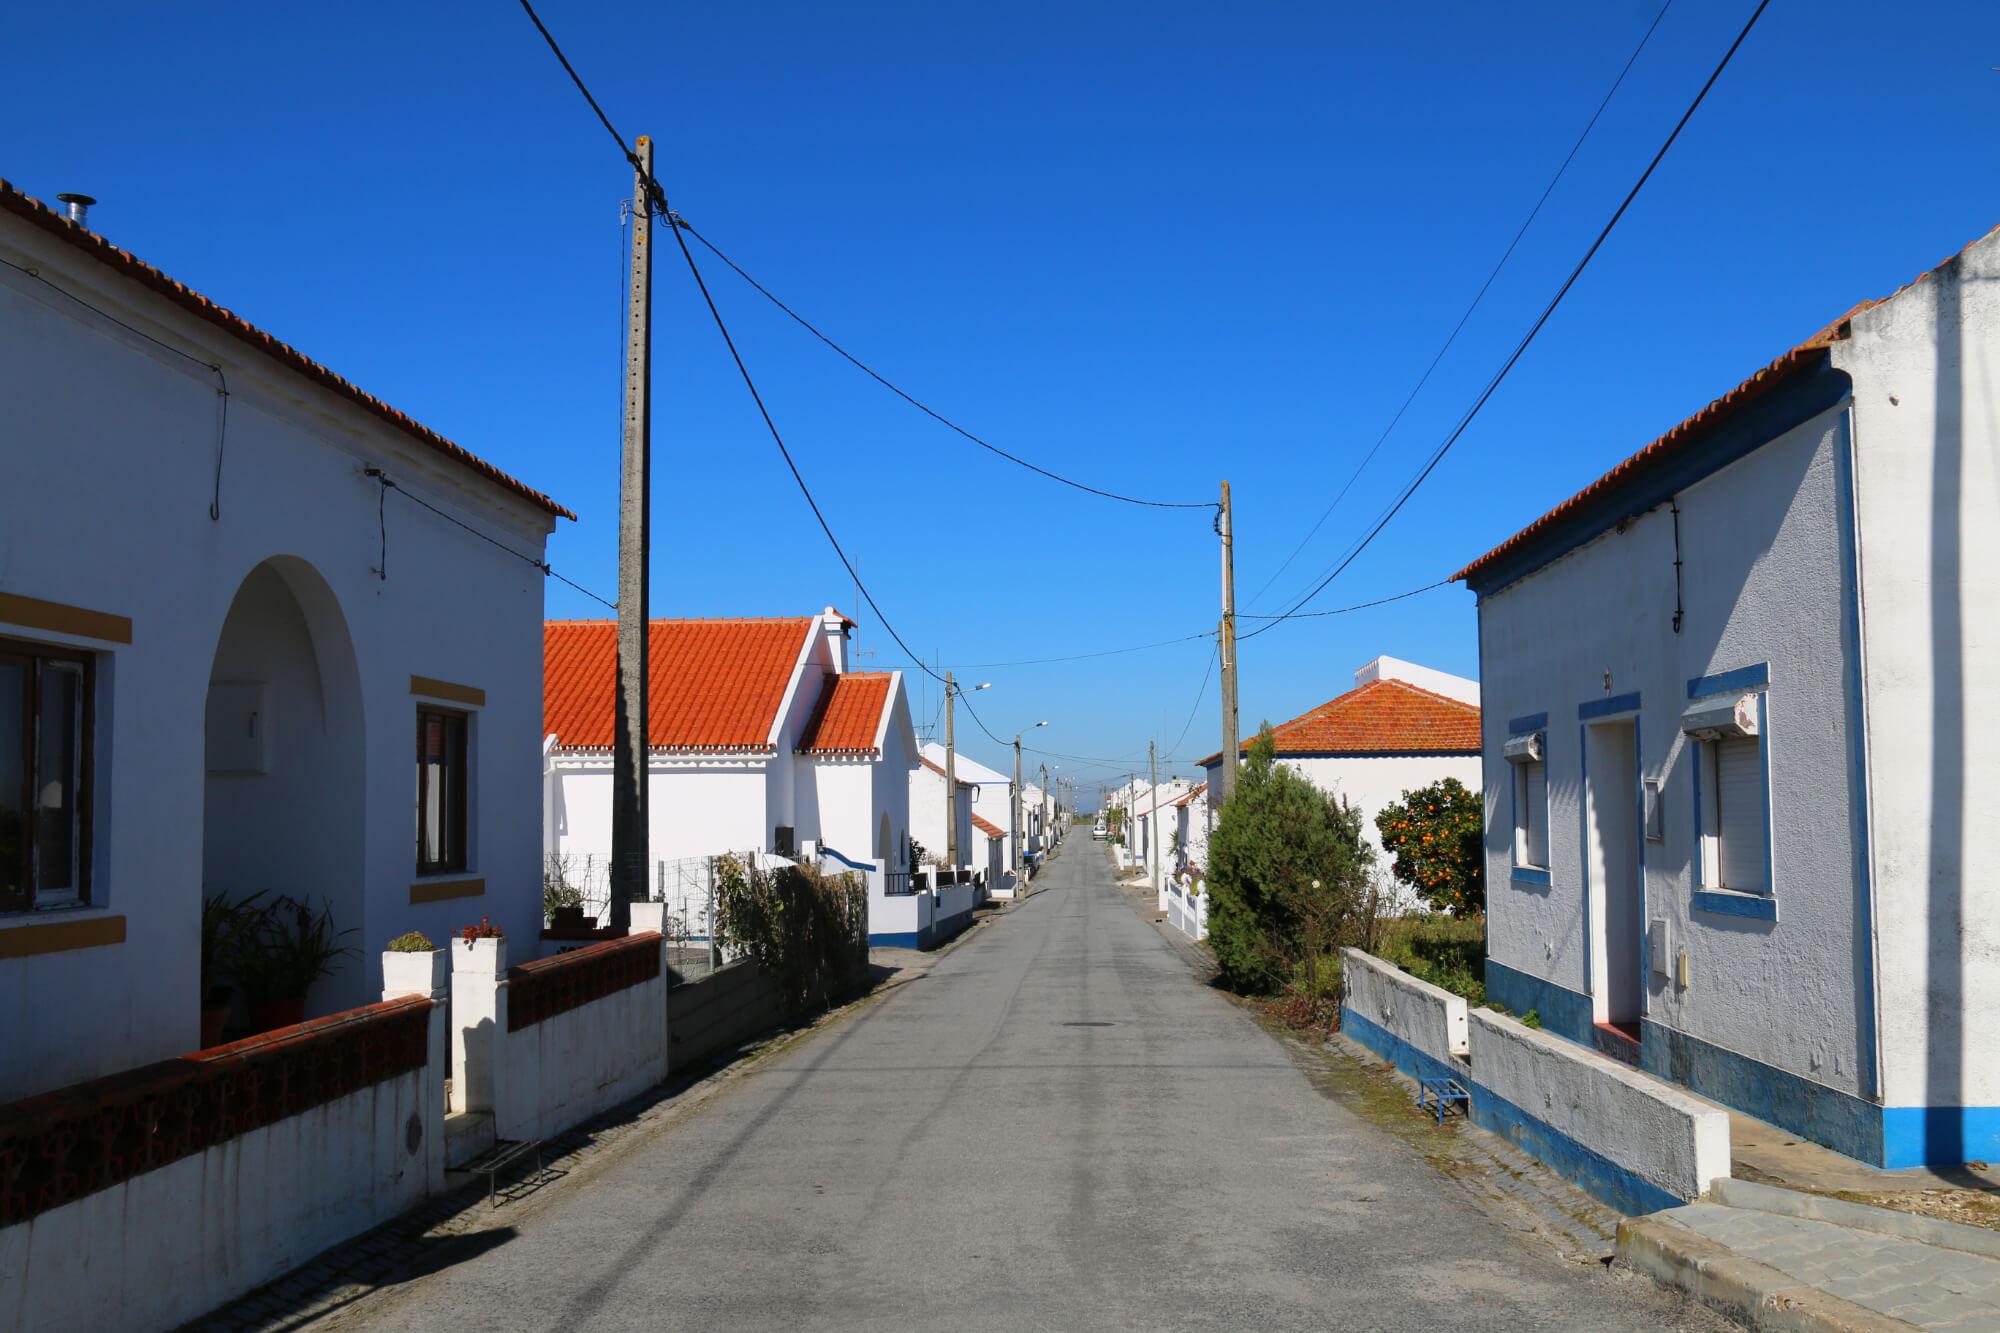 Foros de Vale de Figueira (CMMN)